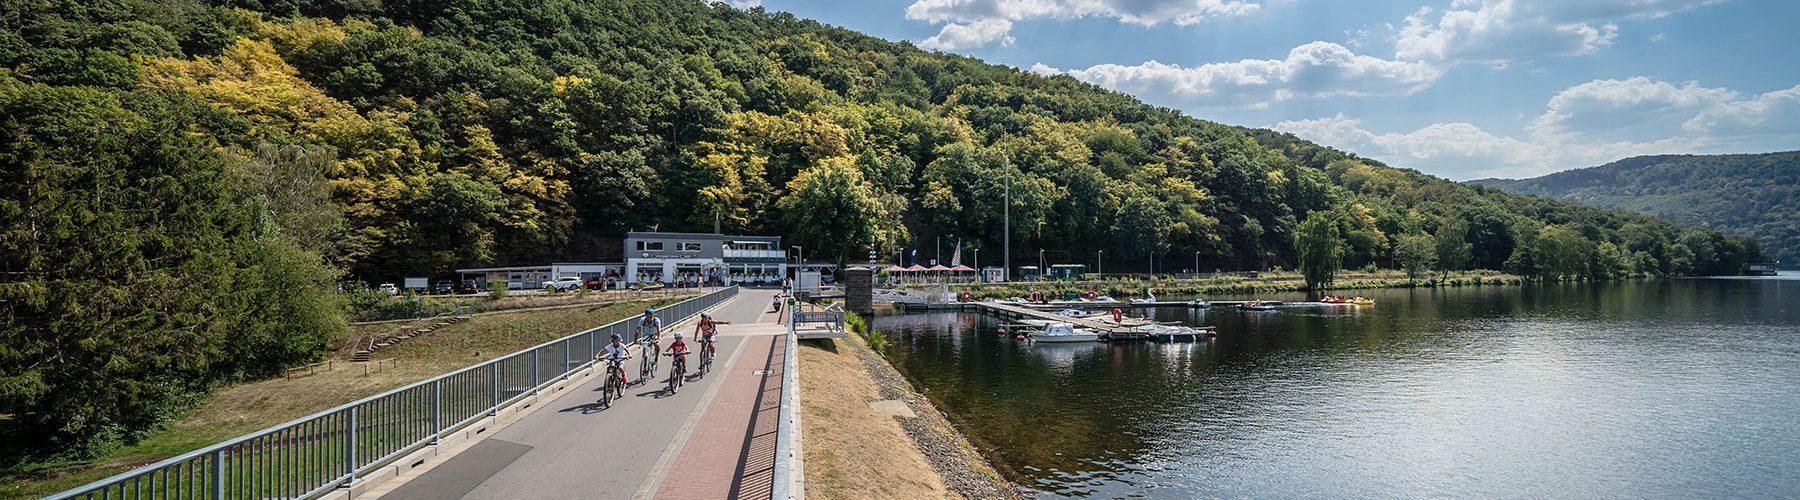 RurUfer-Radweg Stausee Obermaubach